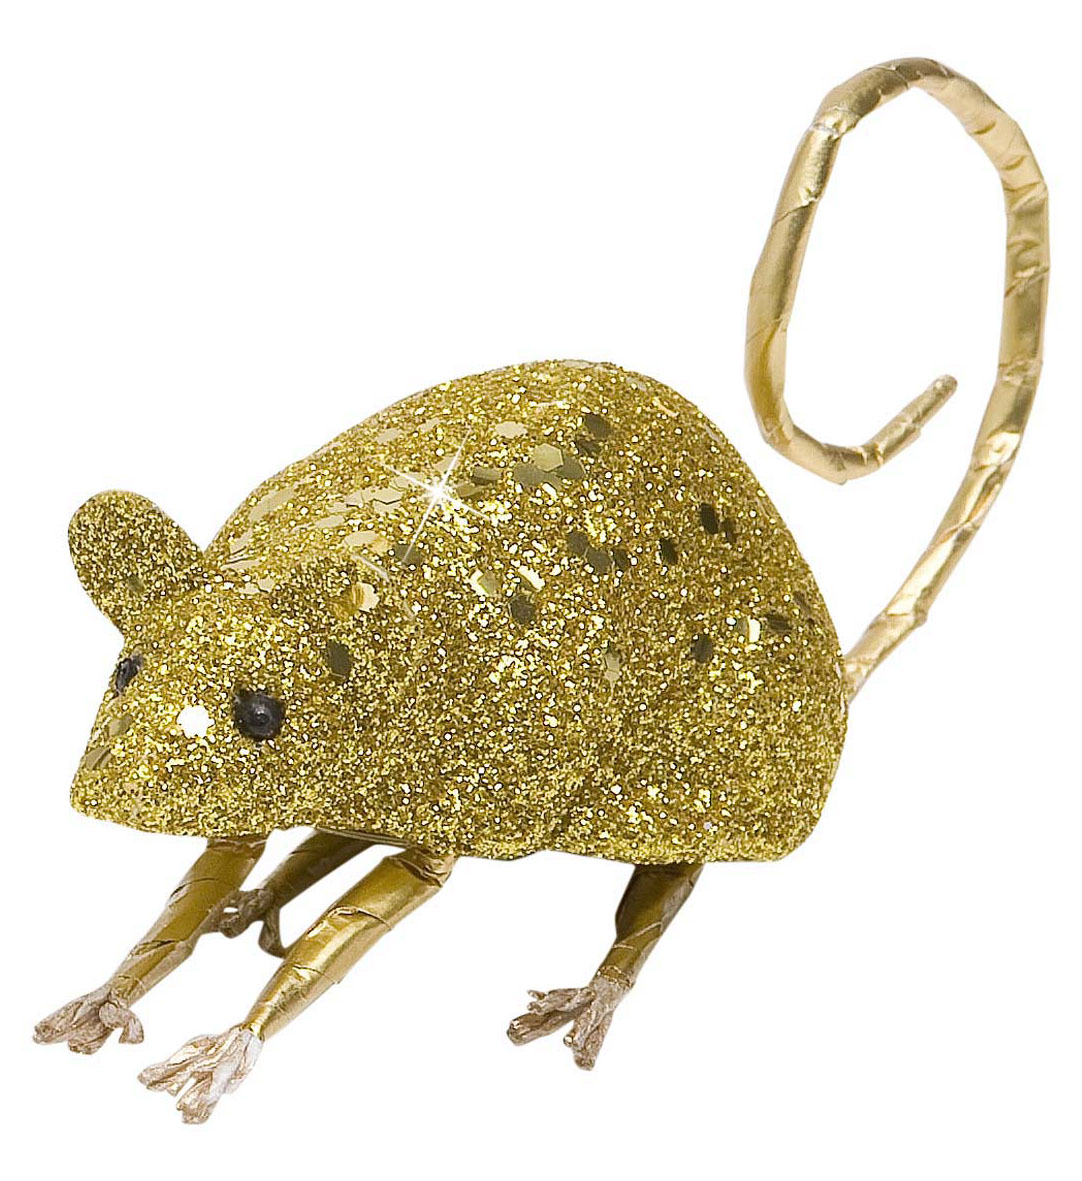 Gold Glitter Mice Halloween Decoration